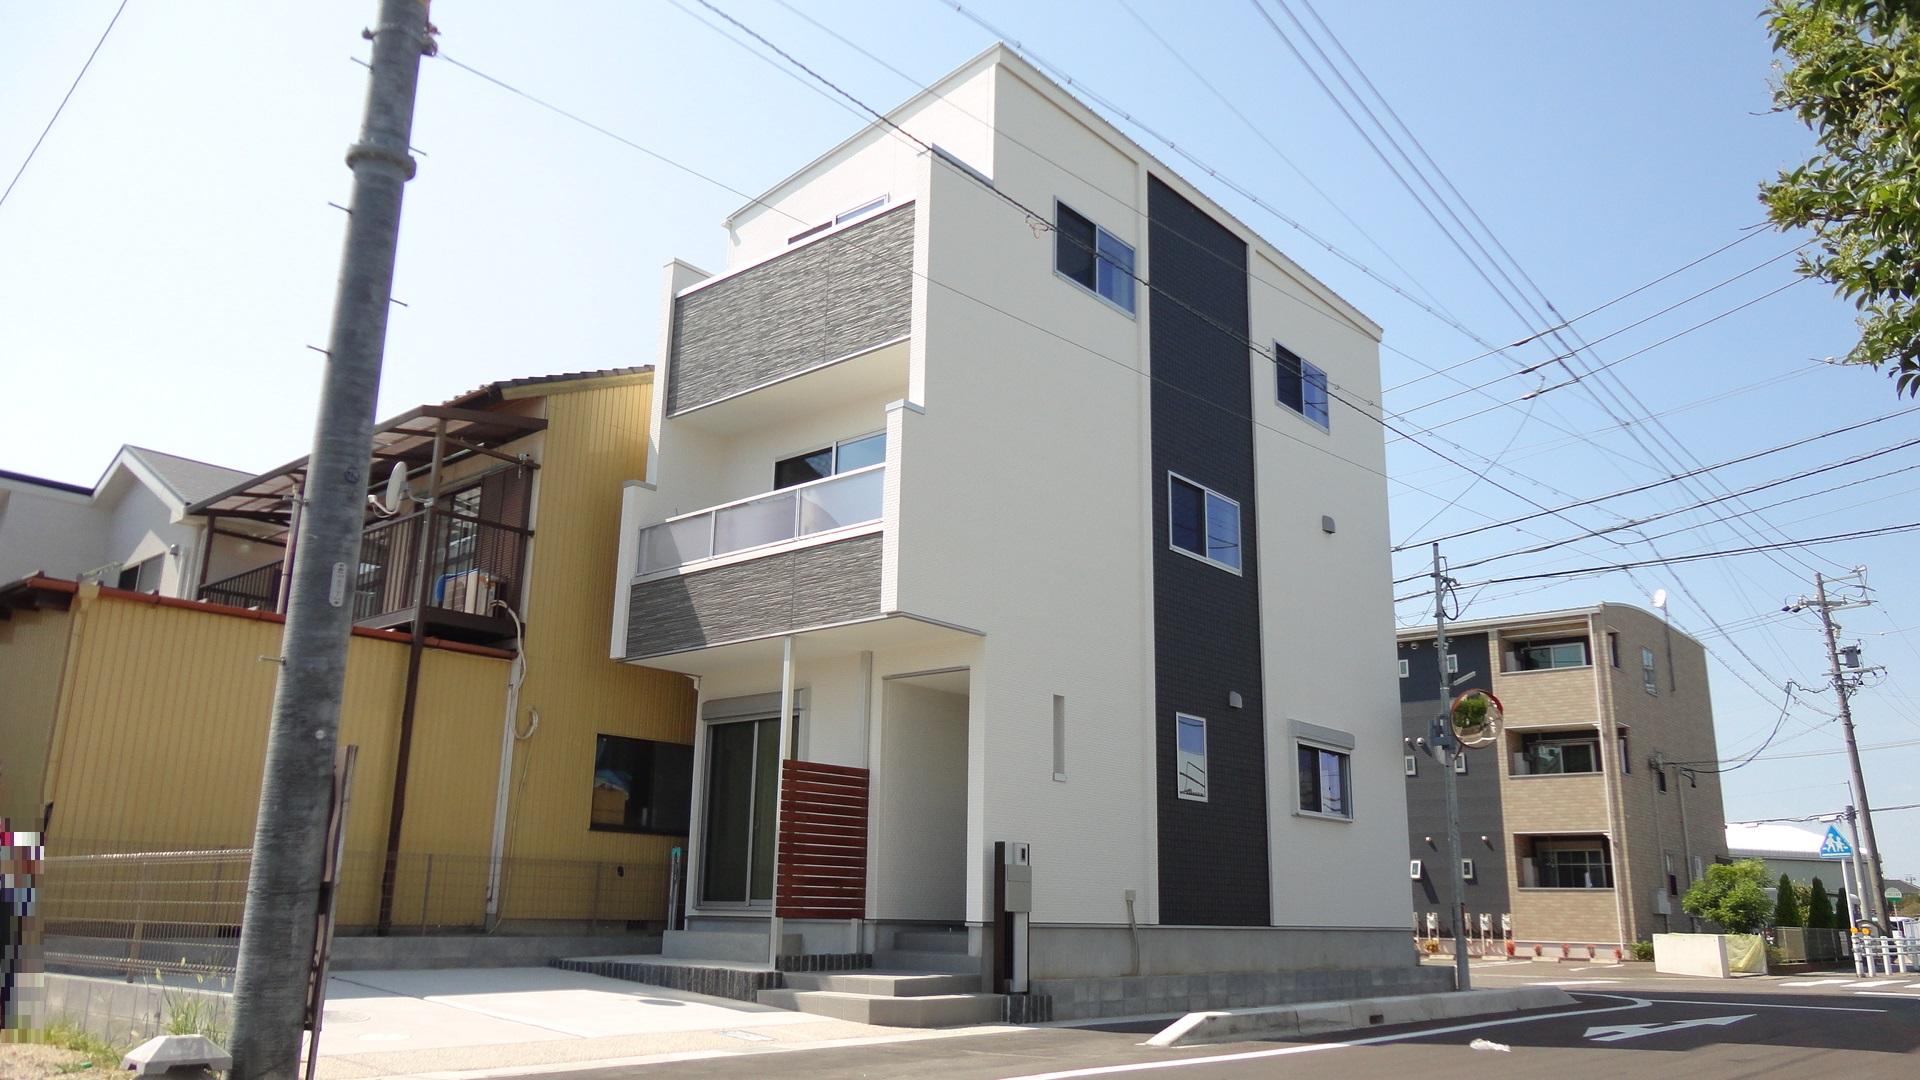 北名古屋・片場の家 2,680万円